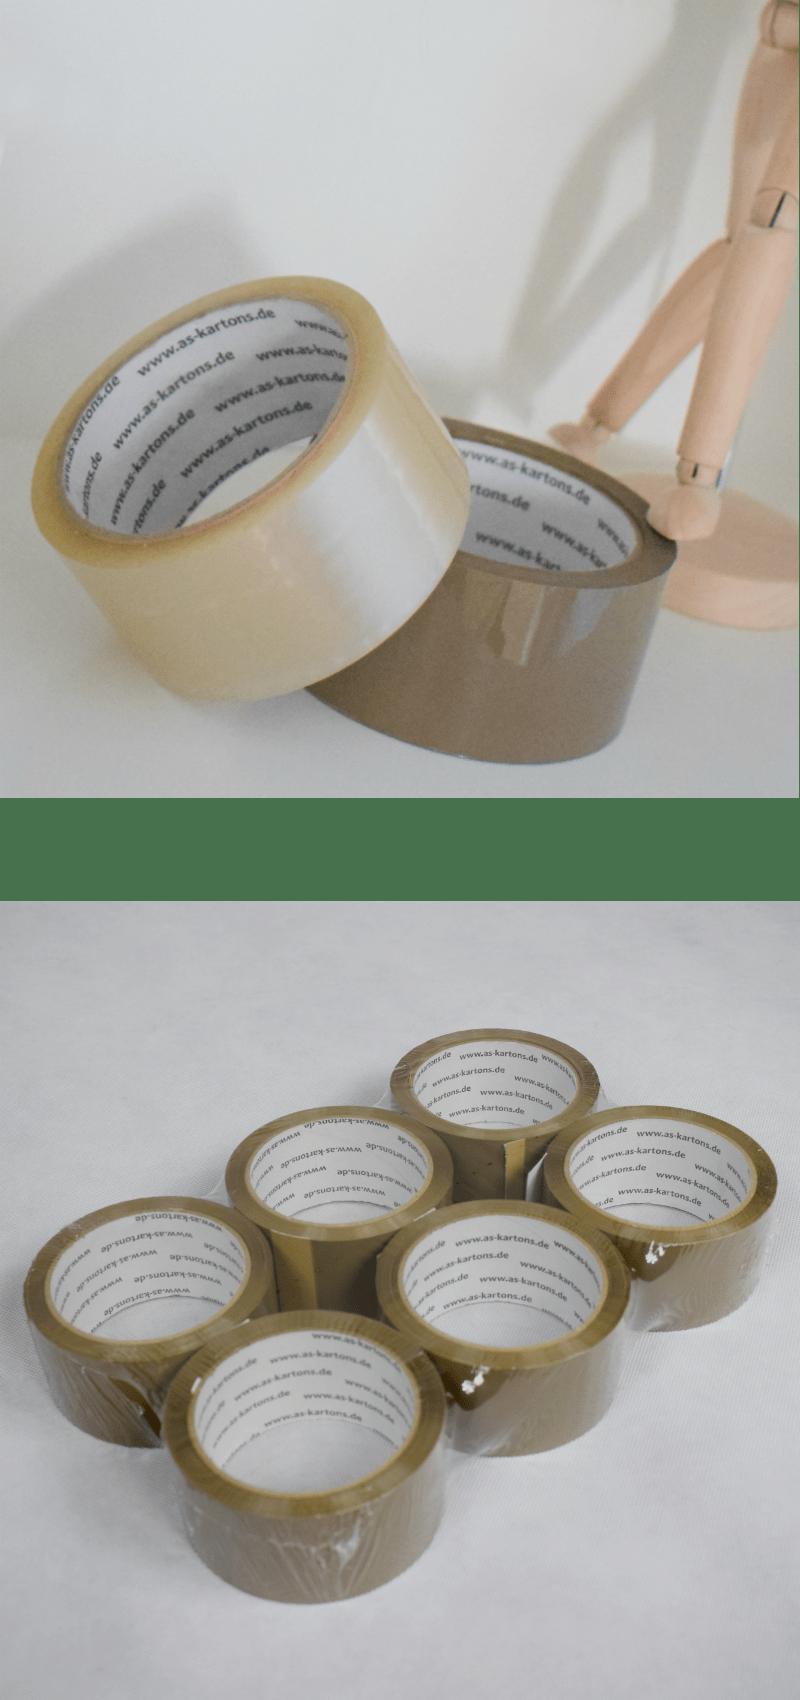 Klebebänder, Klebeband, Klebeband verpackung - As-kartons.de